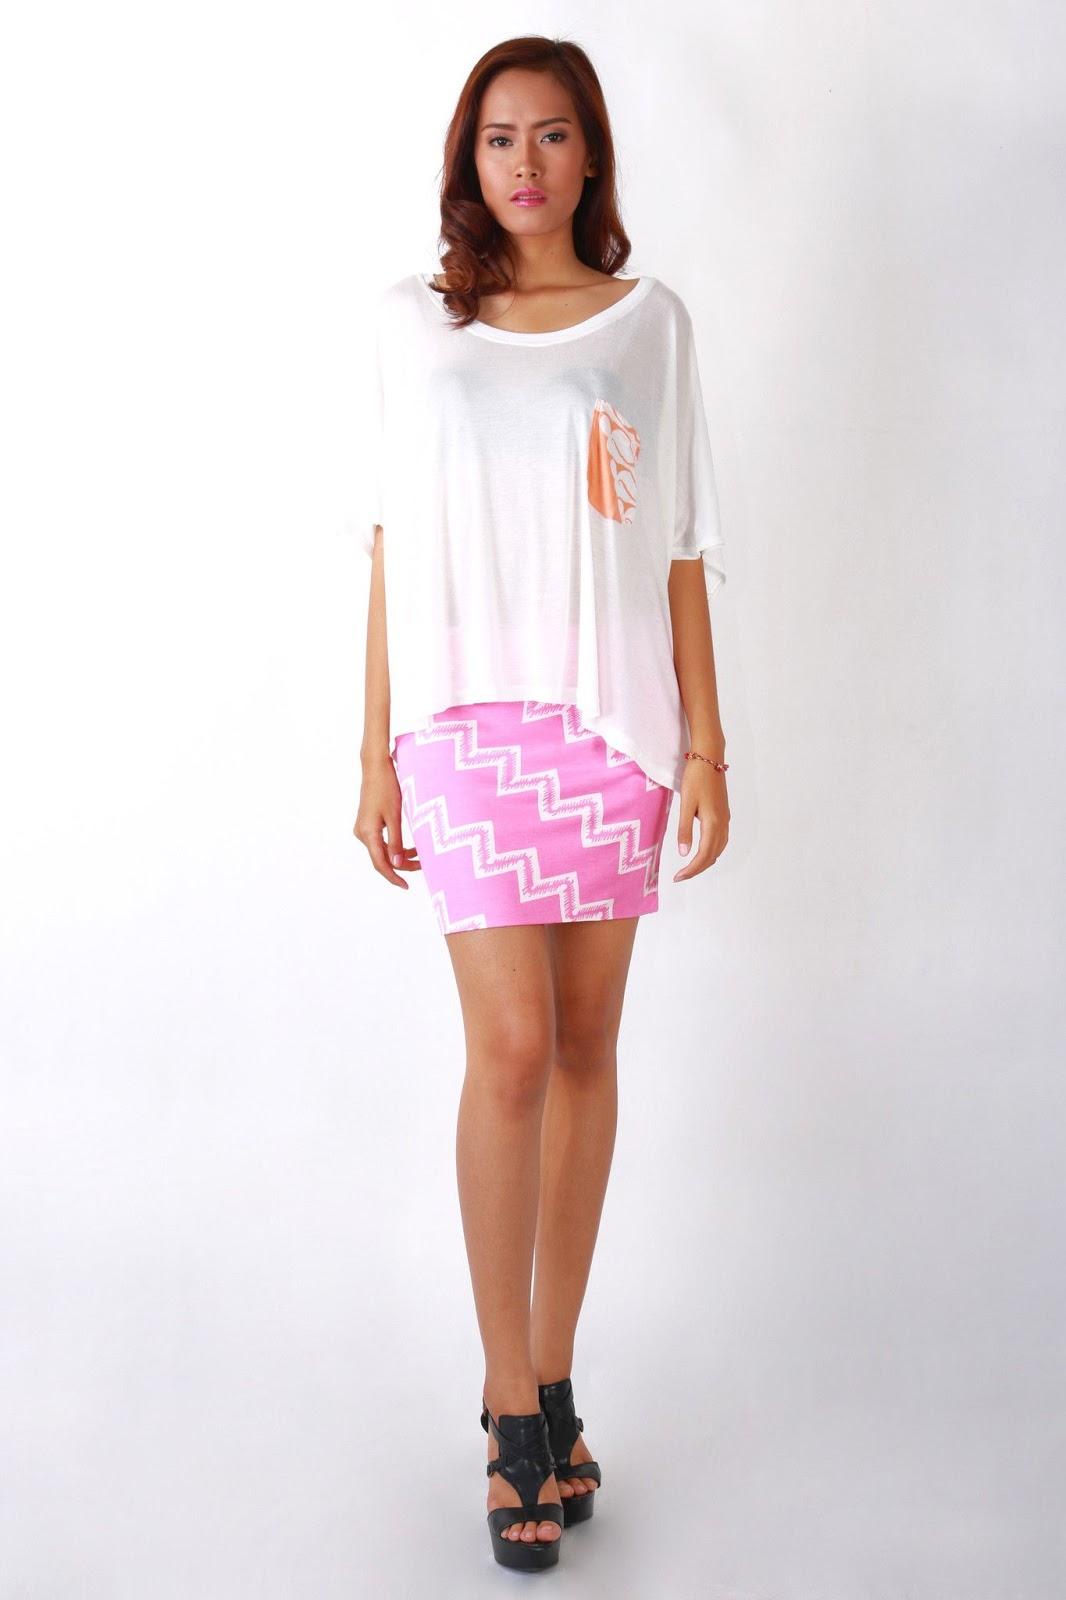 Artis dan Model wanita cantik pakai rok mini anak balita Artis dan Model wanita cantik pakai rok mini anak muda